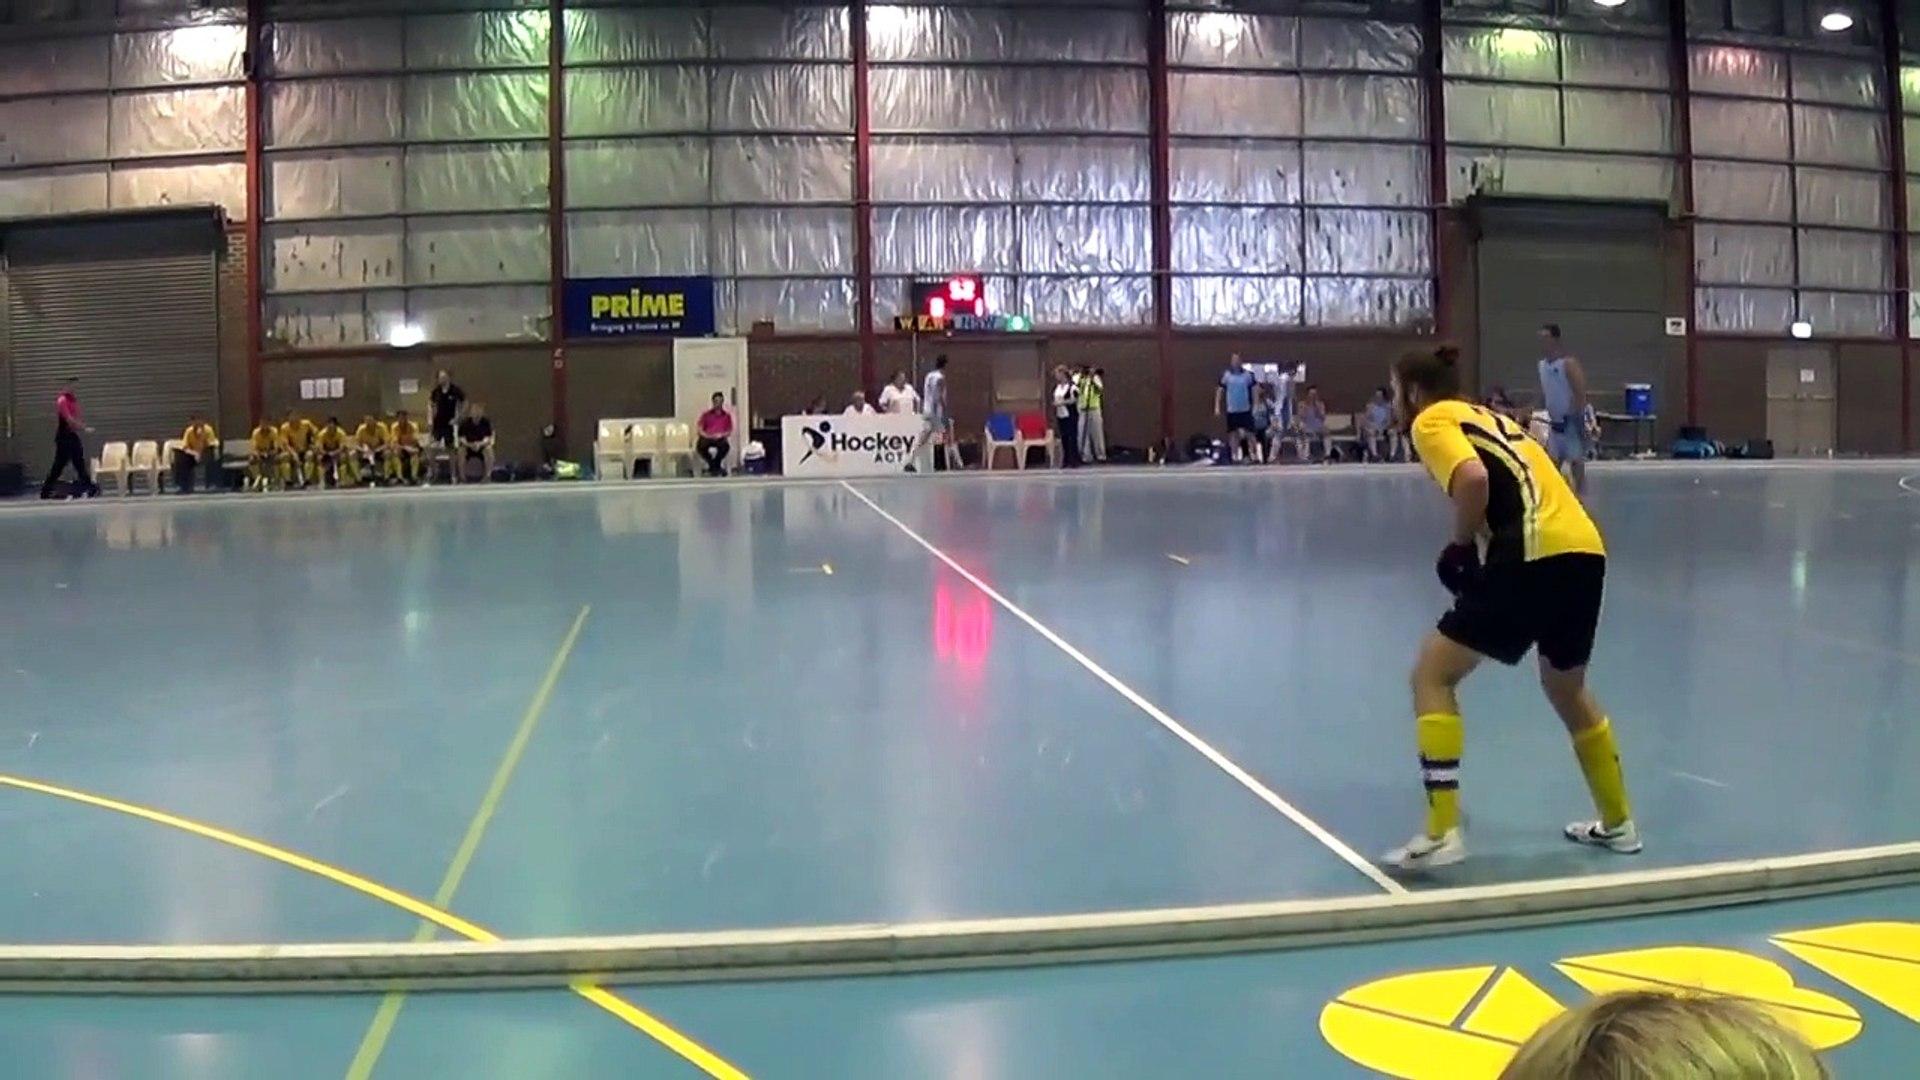 2014 National Indoor Hockey Mens Under 21 Final NSW vs WA.